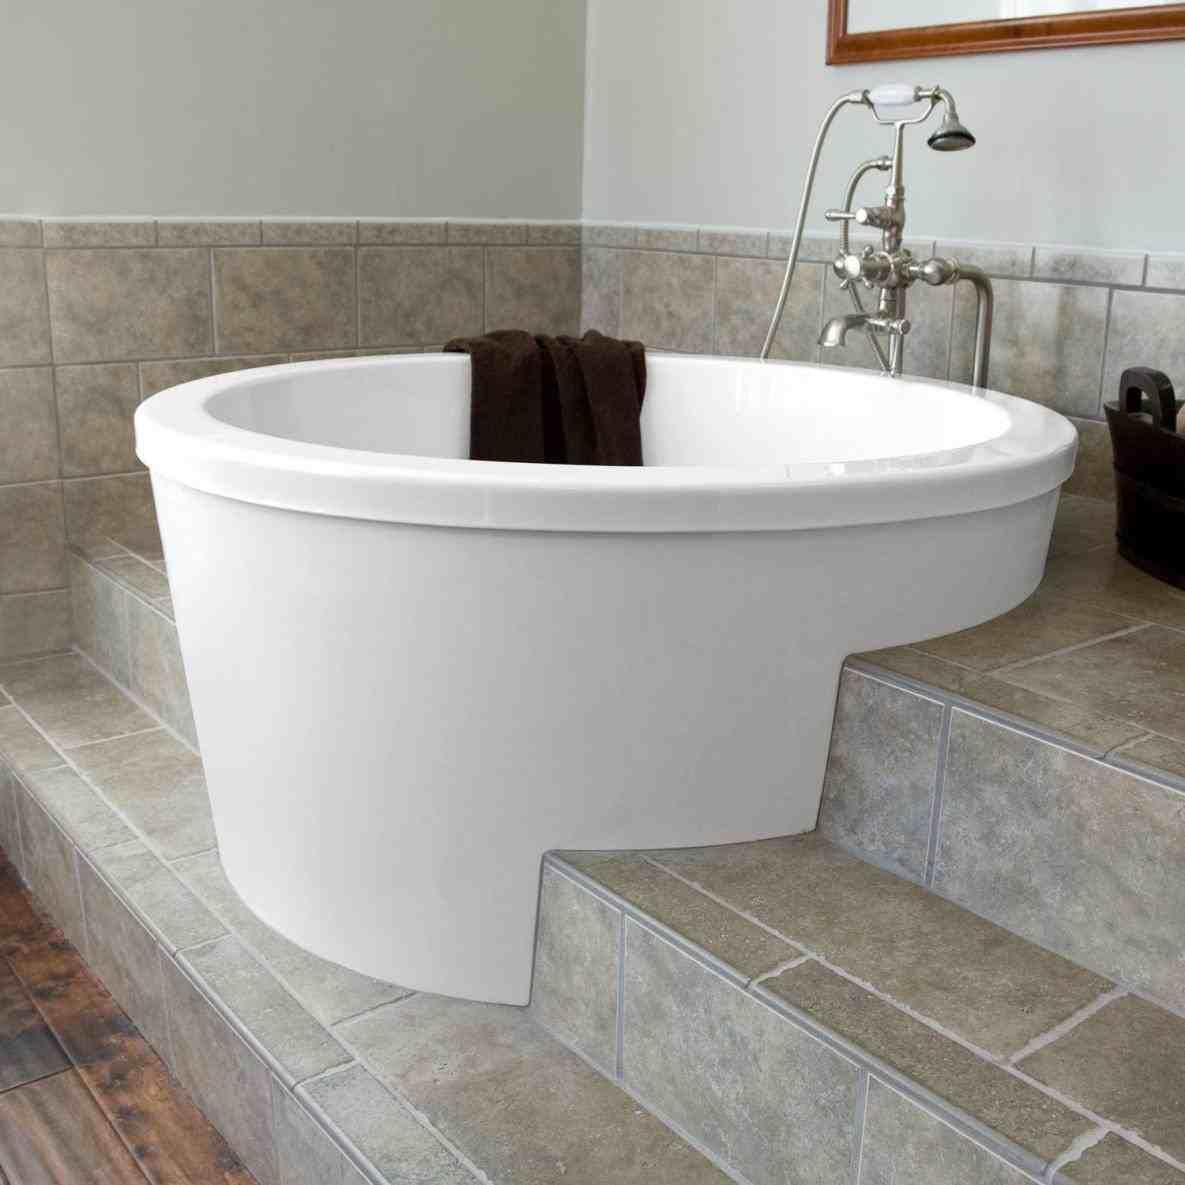 New Post bathtub manufacturers visit bathroomremodelideass.club ...